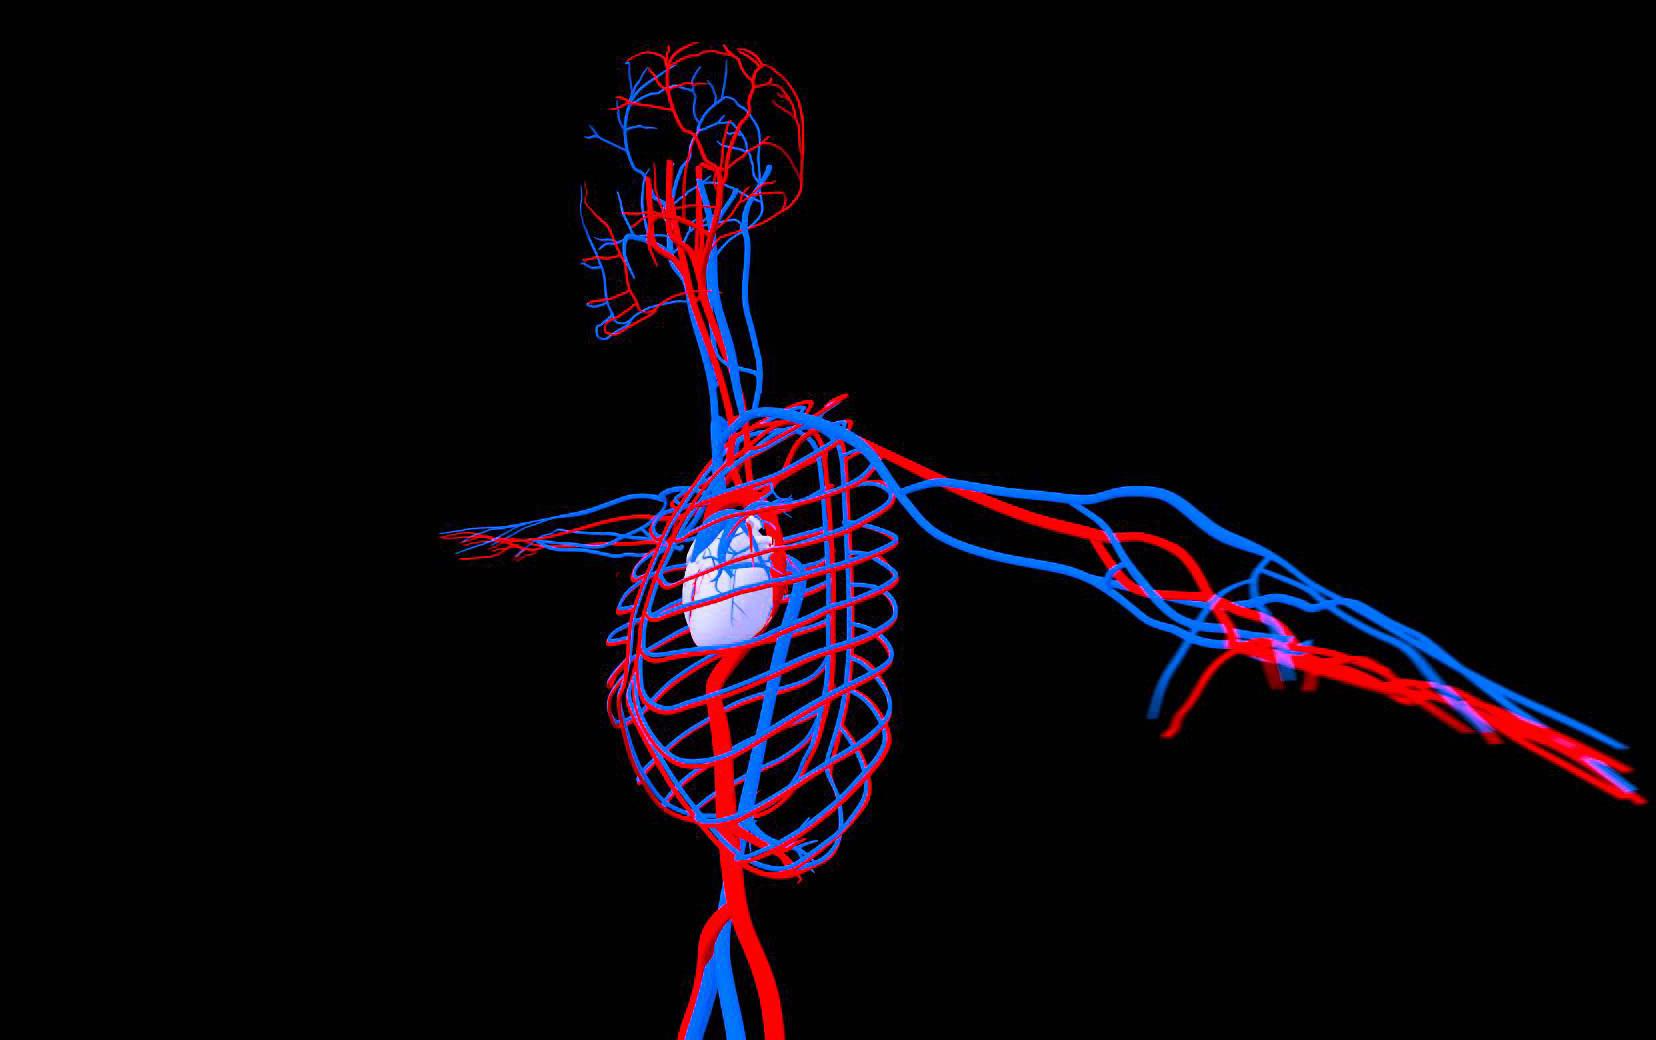 circulatory system images - 1280×720